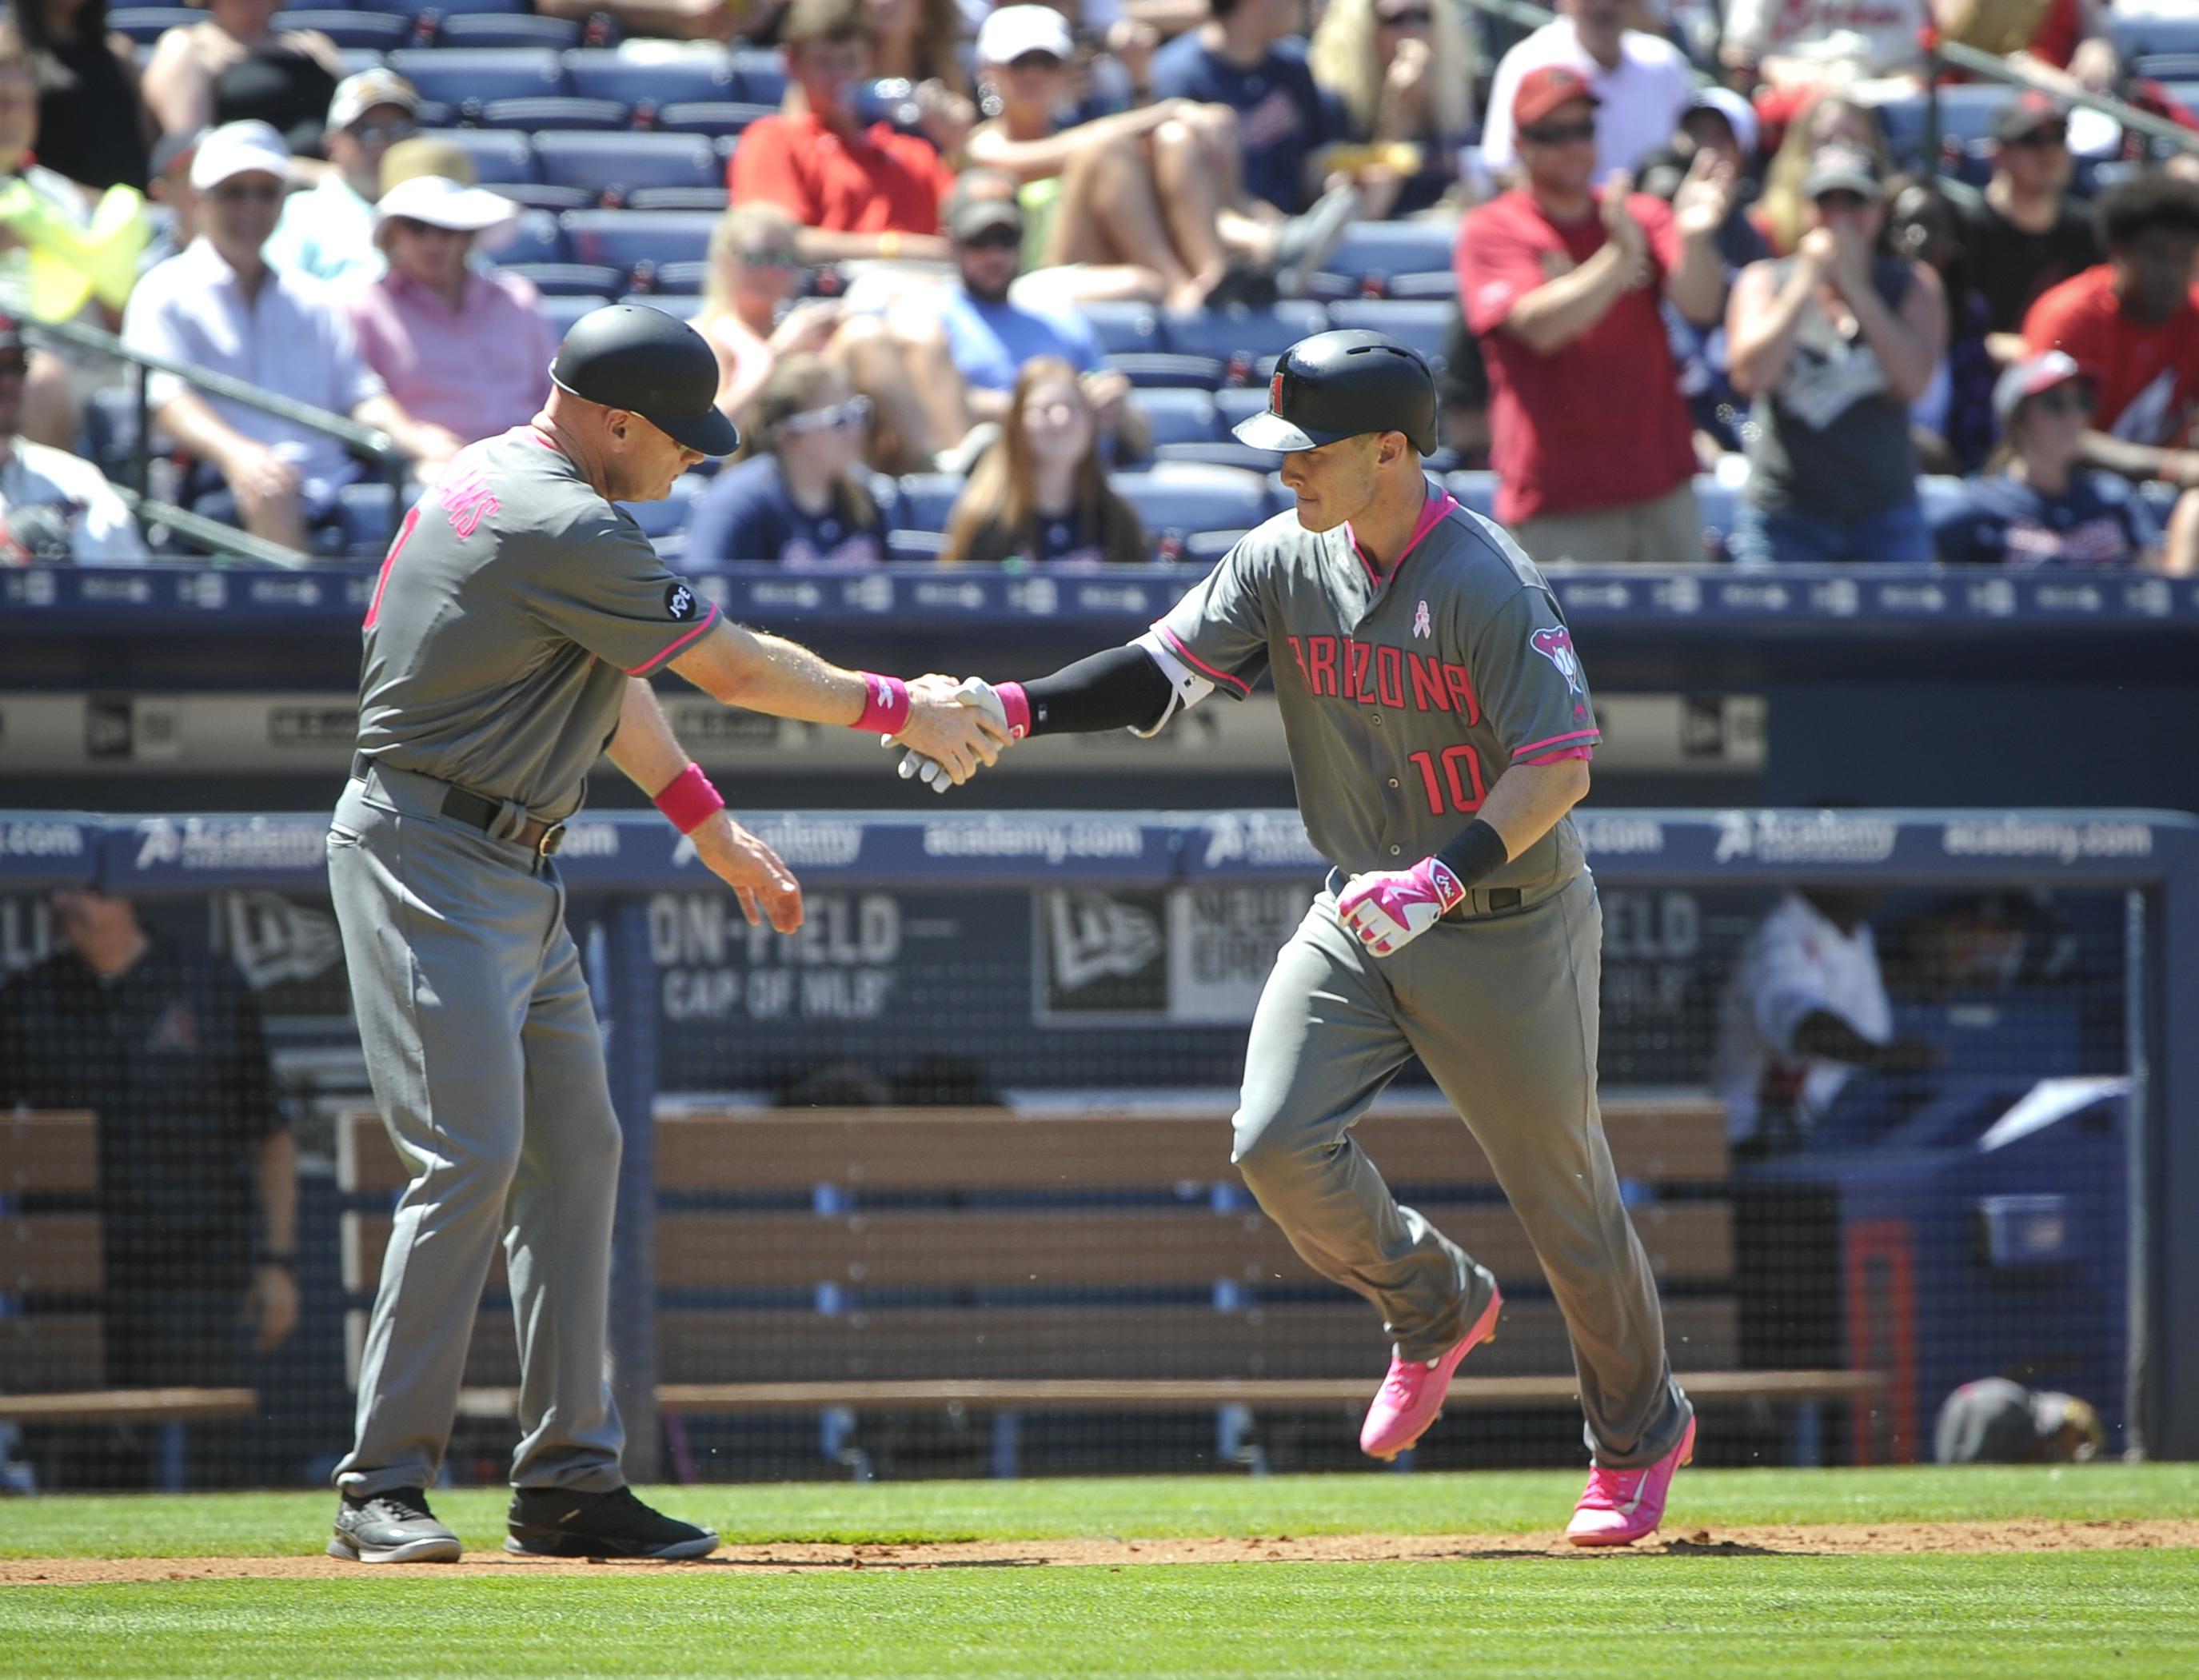 Arizona Diamondbacks' Chris Herrmann (10) rounds third base as third base coach Matt Williams congratulates him on his home run during the seventh inning of a baseball game against the Atlanta Braves, Sunday, May 8, 2016, in Atlanta. (AP Photo/John Amis)